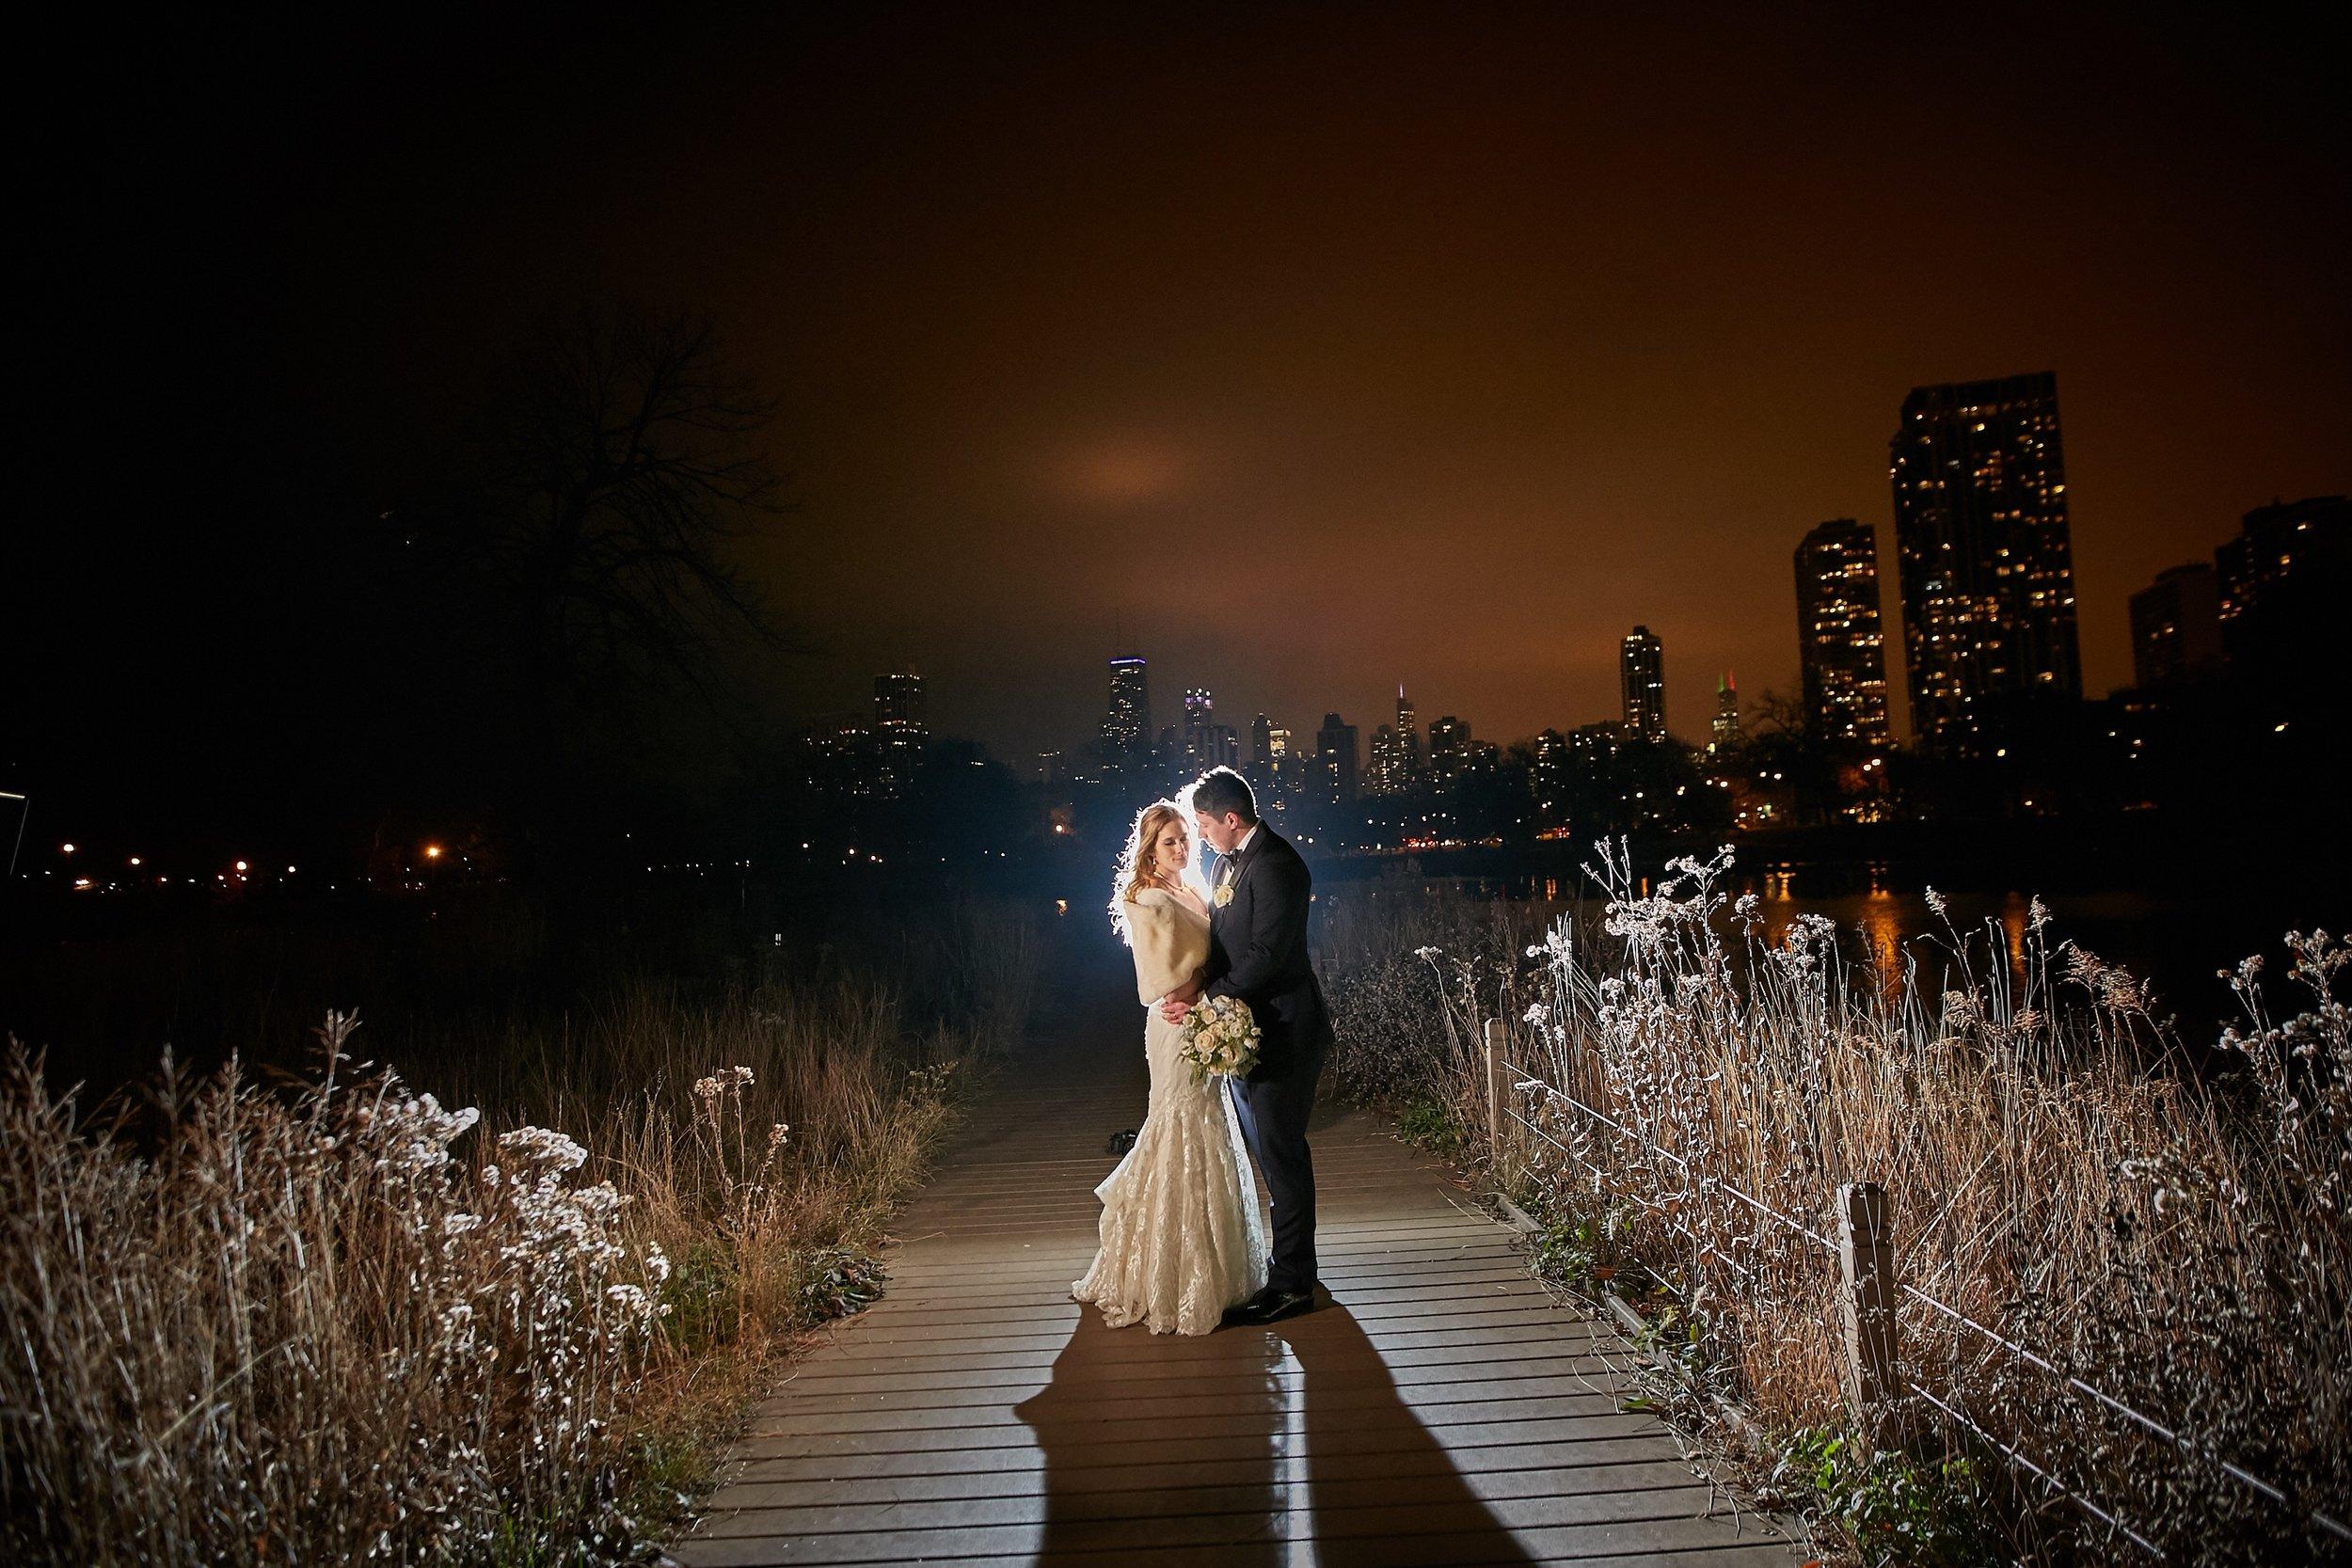 bride groom lincoln park night shot chicago sky line wedding photo